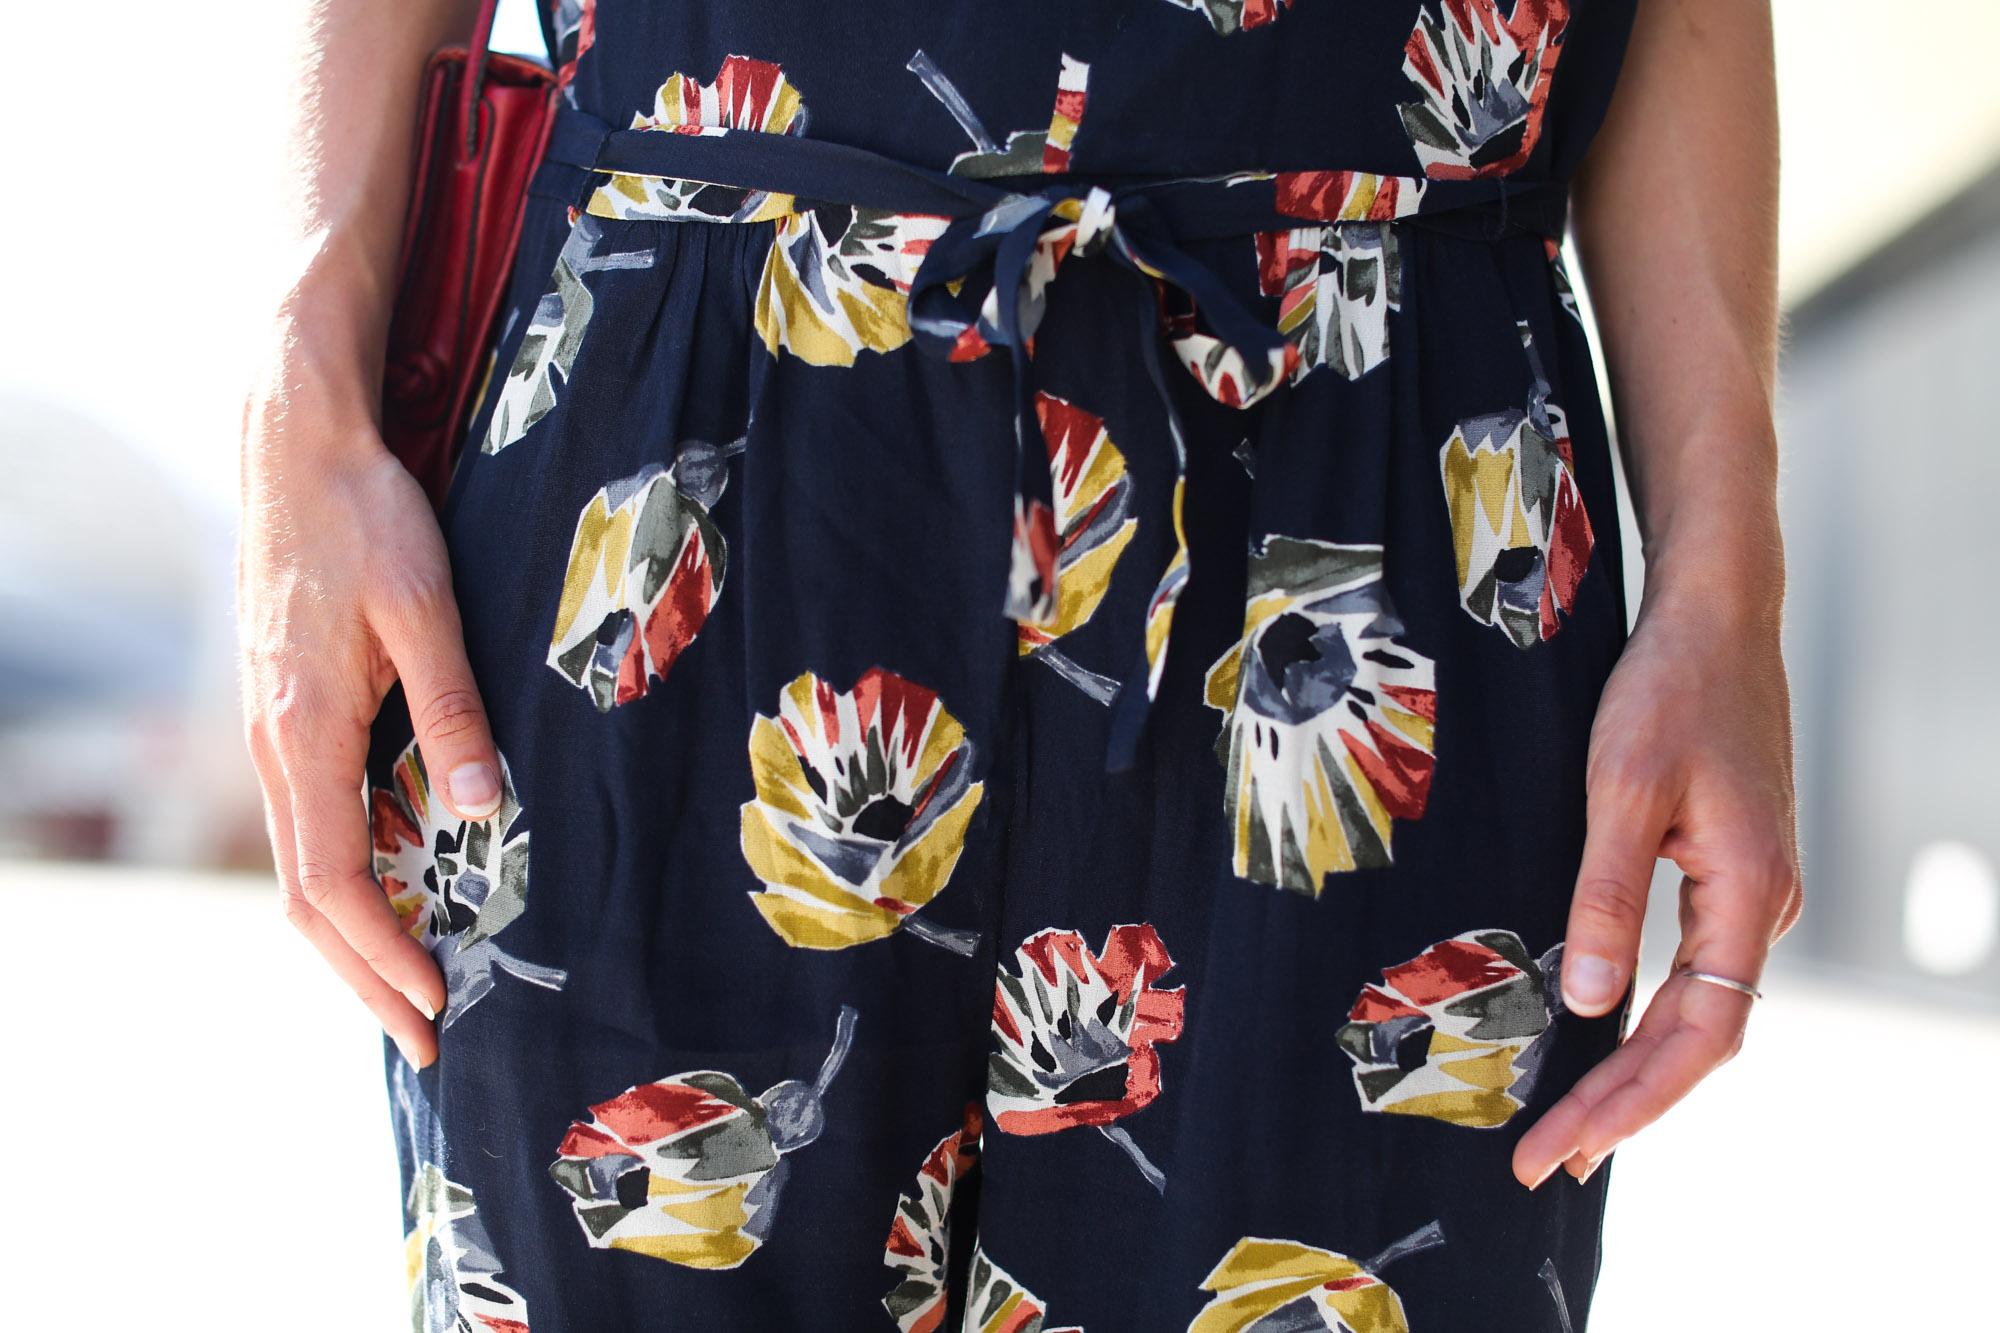 Clochet-streetstyle-vagabond-sliders-zara-flowers-jumpsuit-11